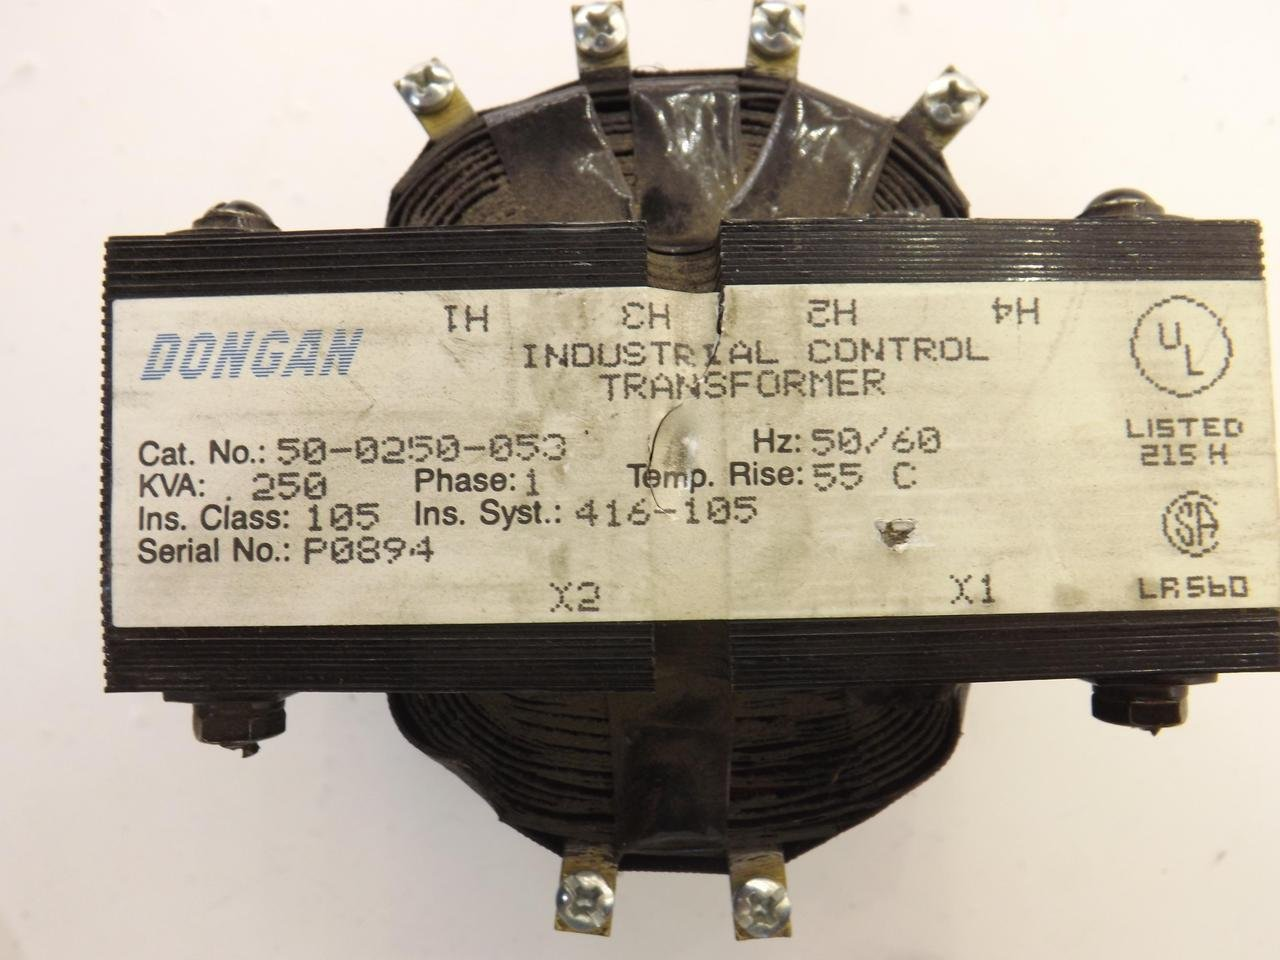 Dongan 50-0250-053 Industrial Control Transformer T36765